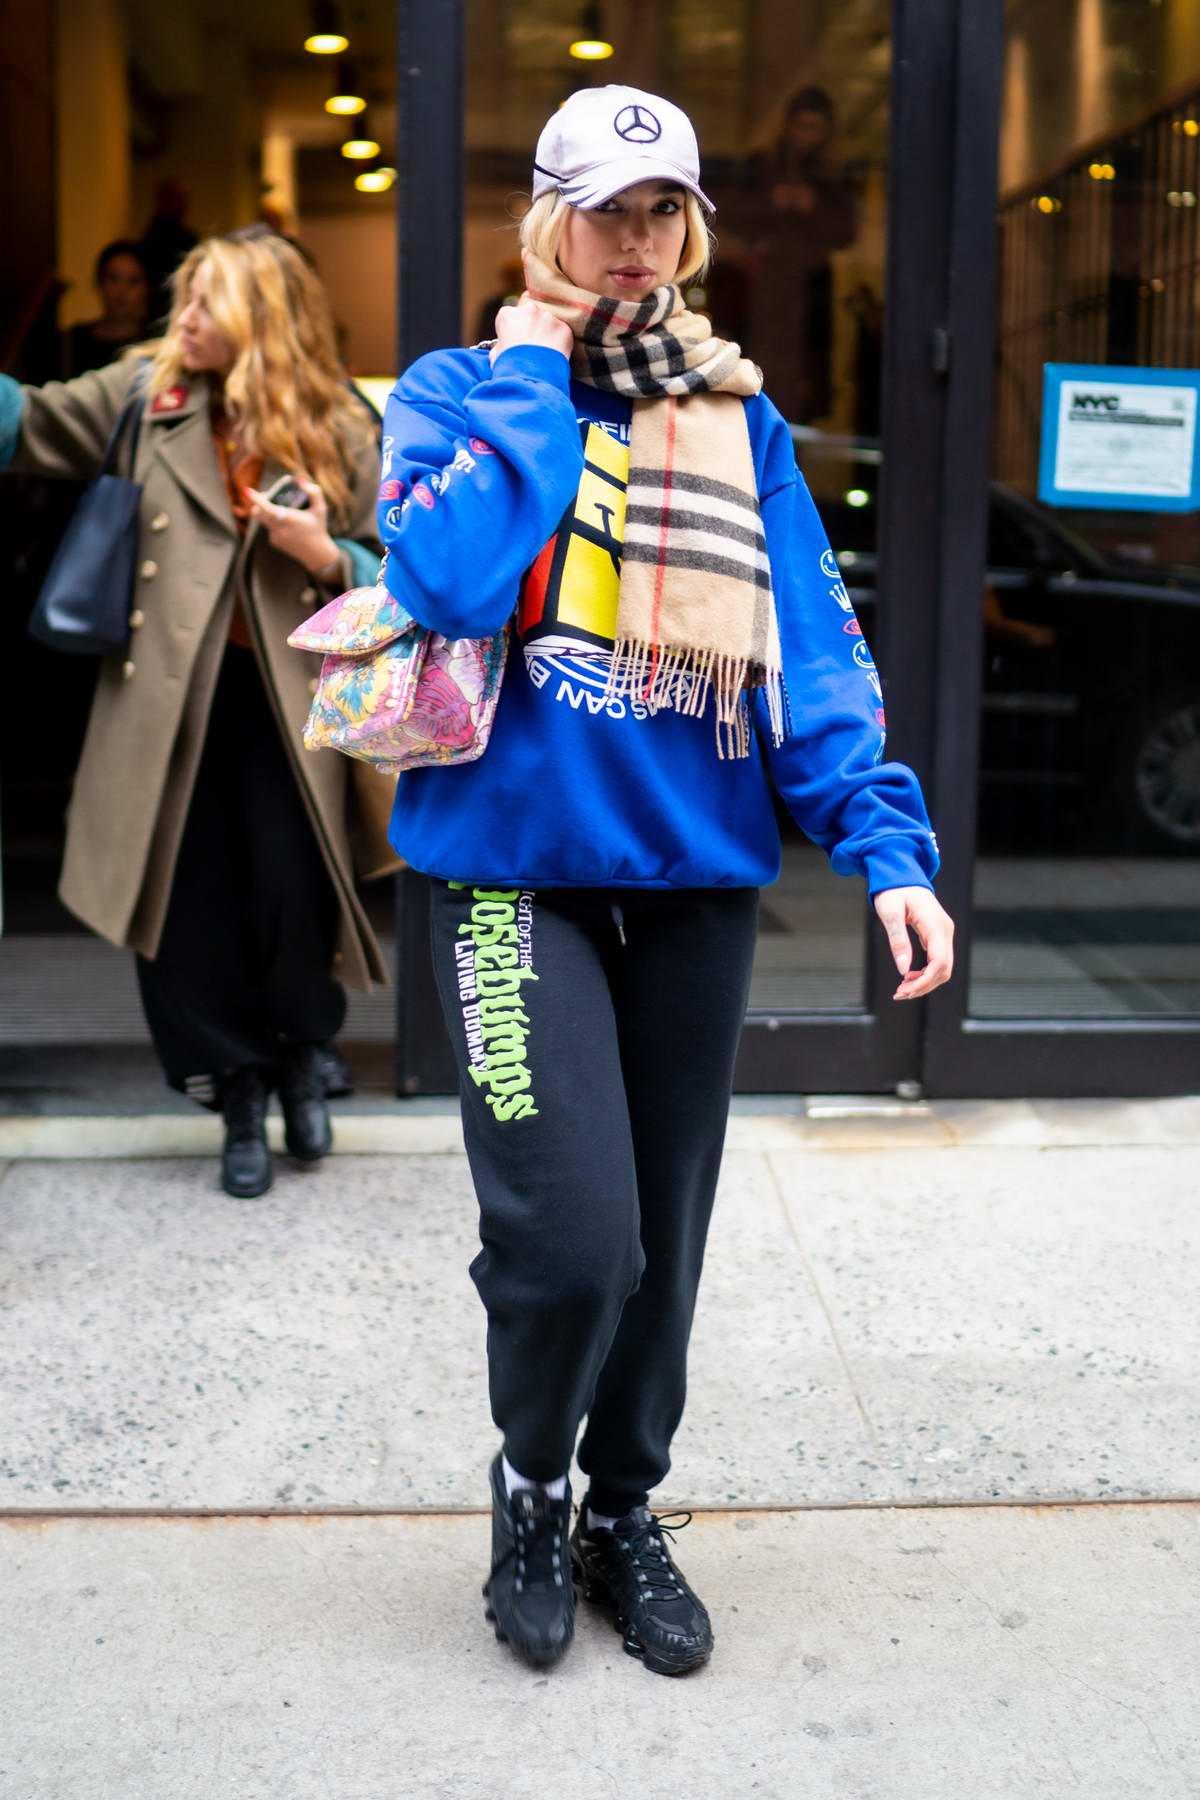 Dua Lipa seen wearing a bright blue sweatshirt as she leaves Milk Studios in New York City